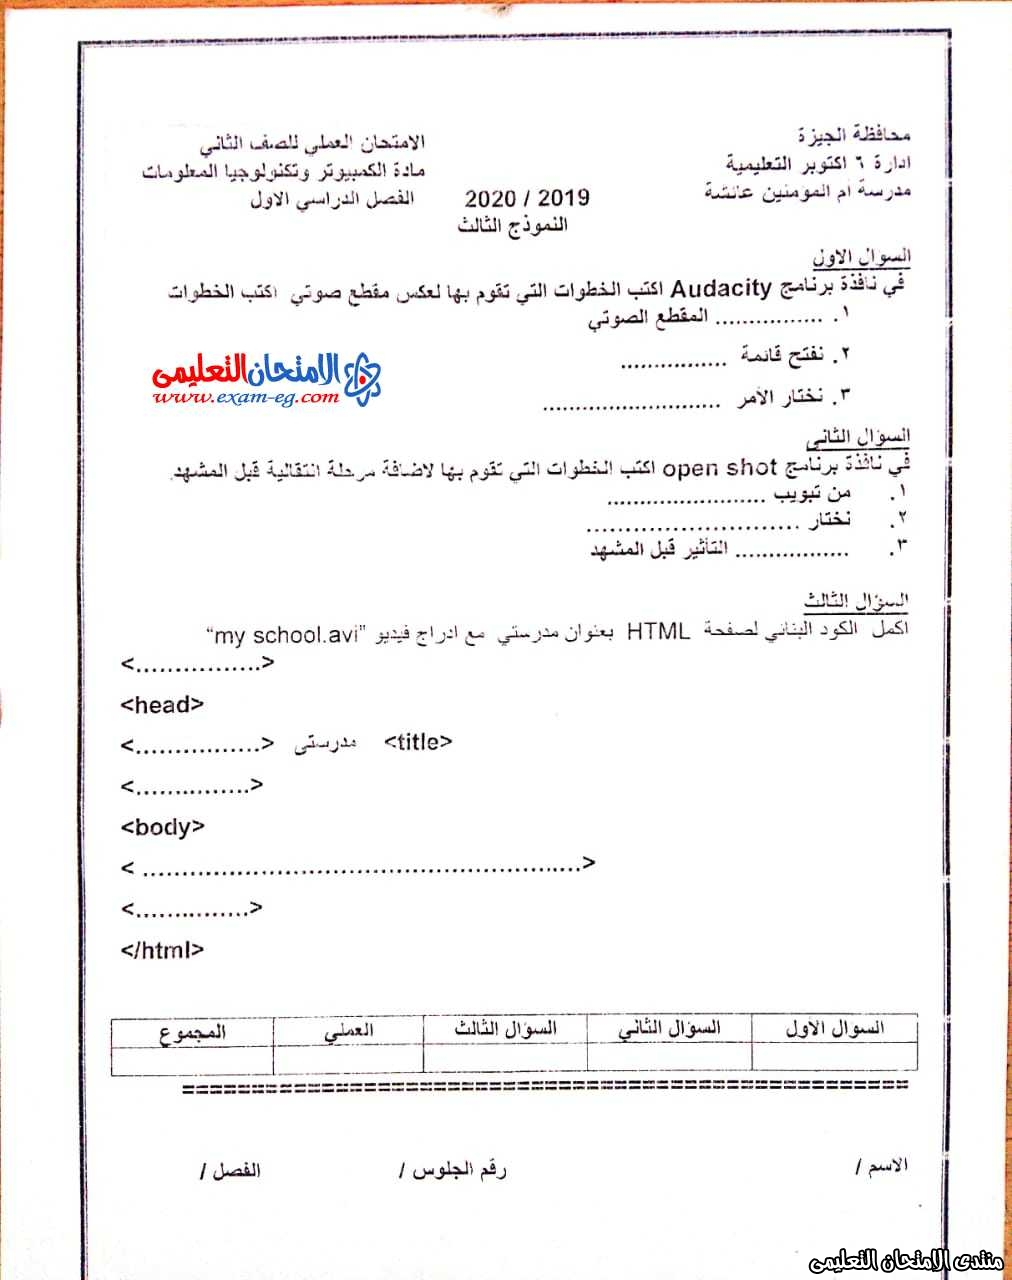 exam-eg.com_157754749355062.jpeg